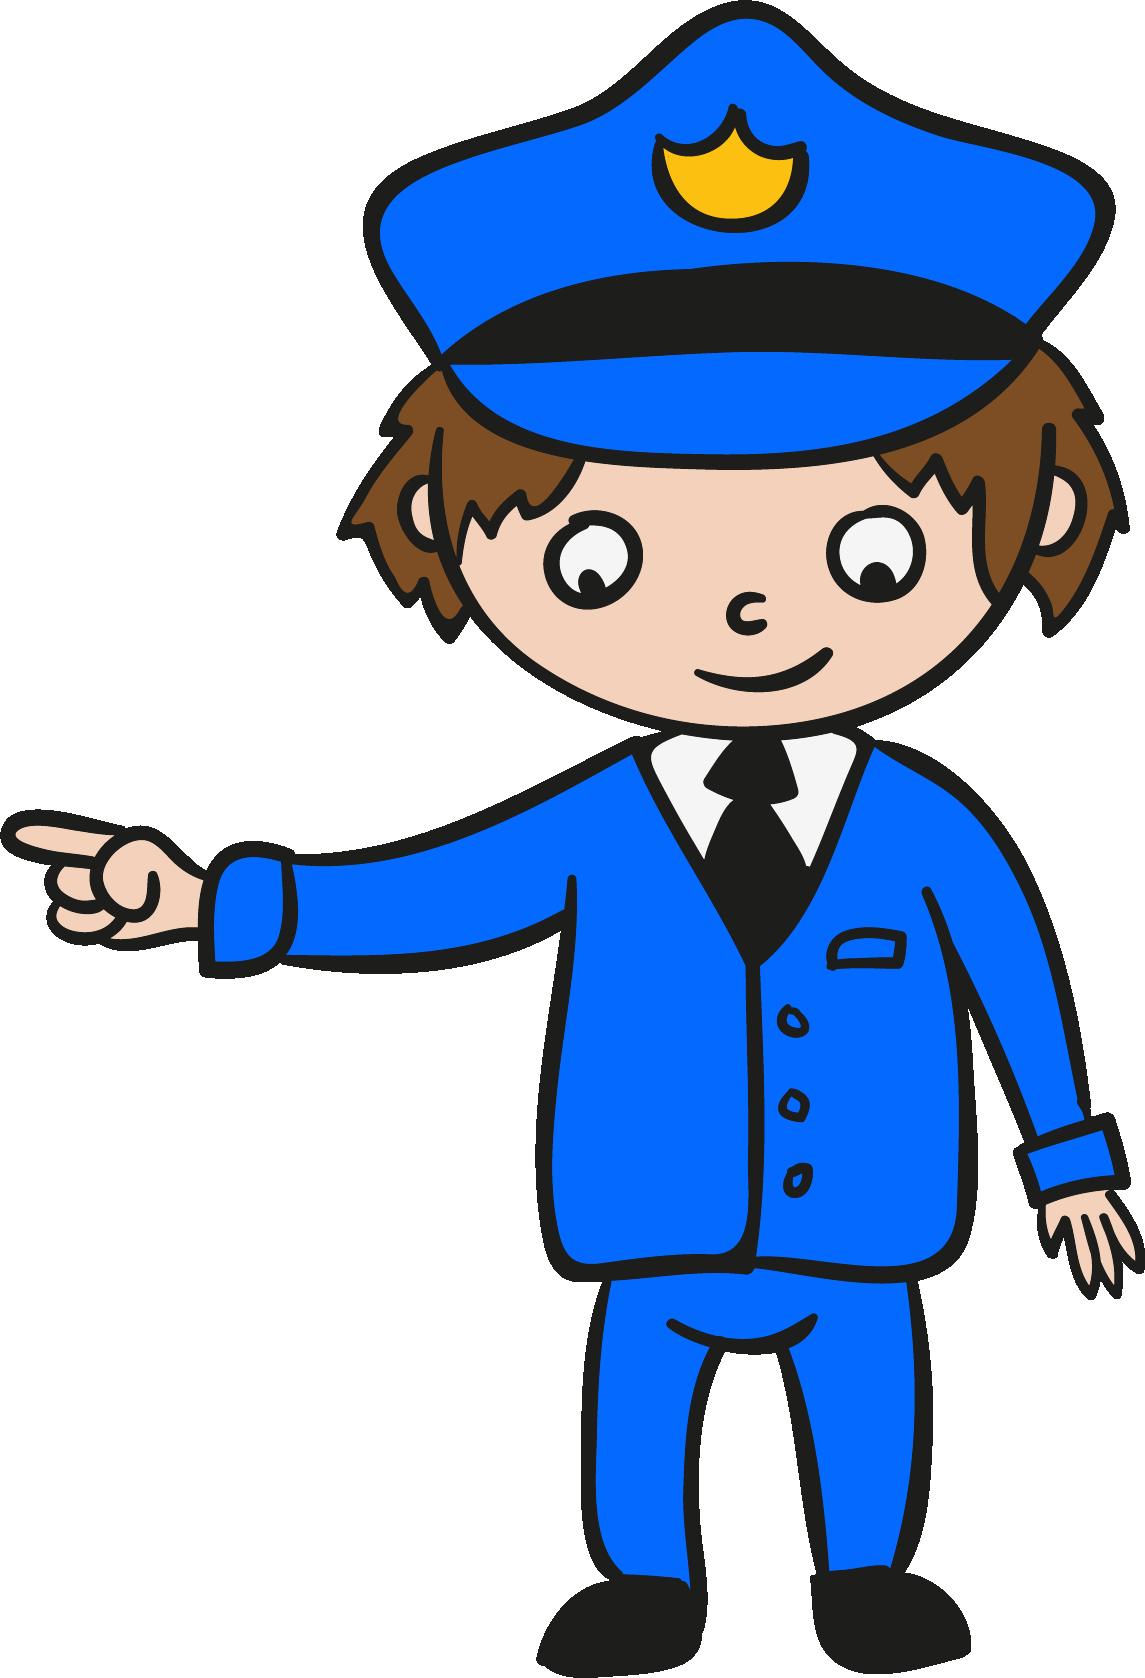 jpg free library Police officer Clip art